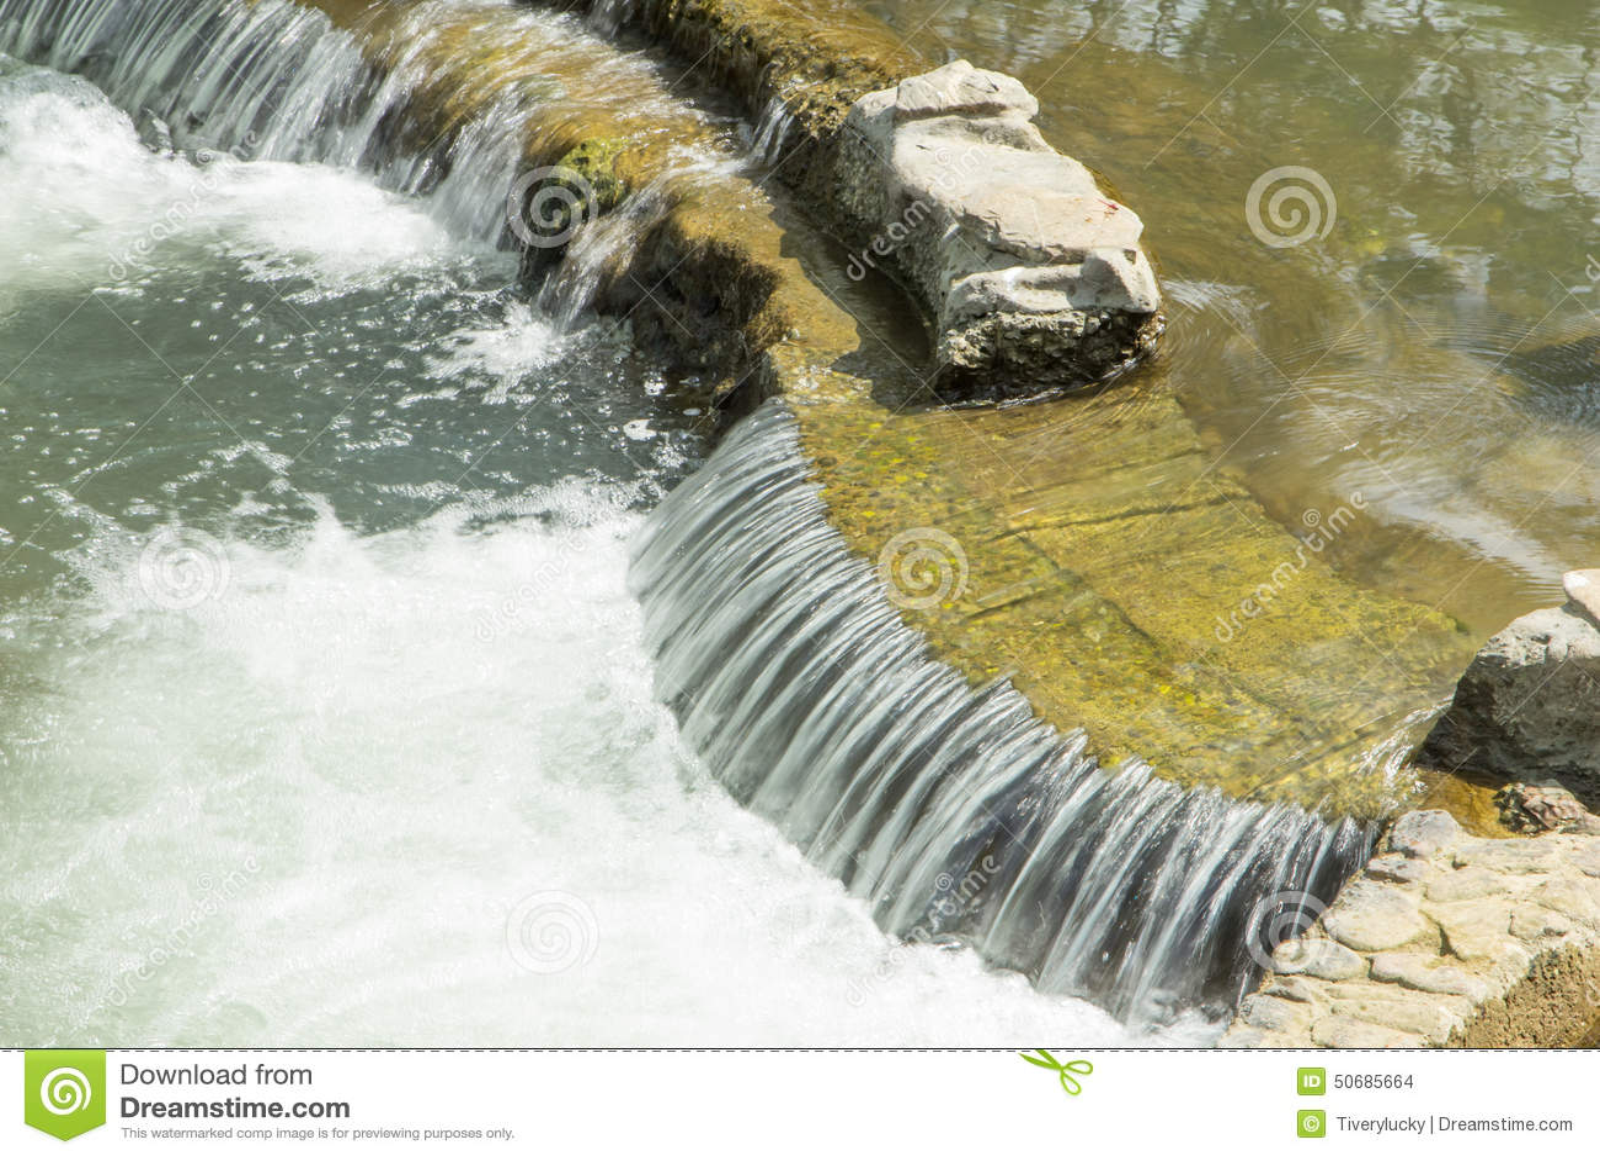 Download 美丽的河小河 库存照片. 图片 包括有 纹理, 背包, 蓝色, 洪水, 秋天, 摇摆, 急流, 行动, 模式 - 50685664